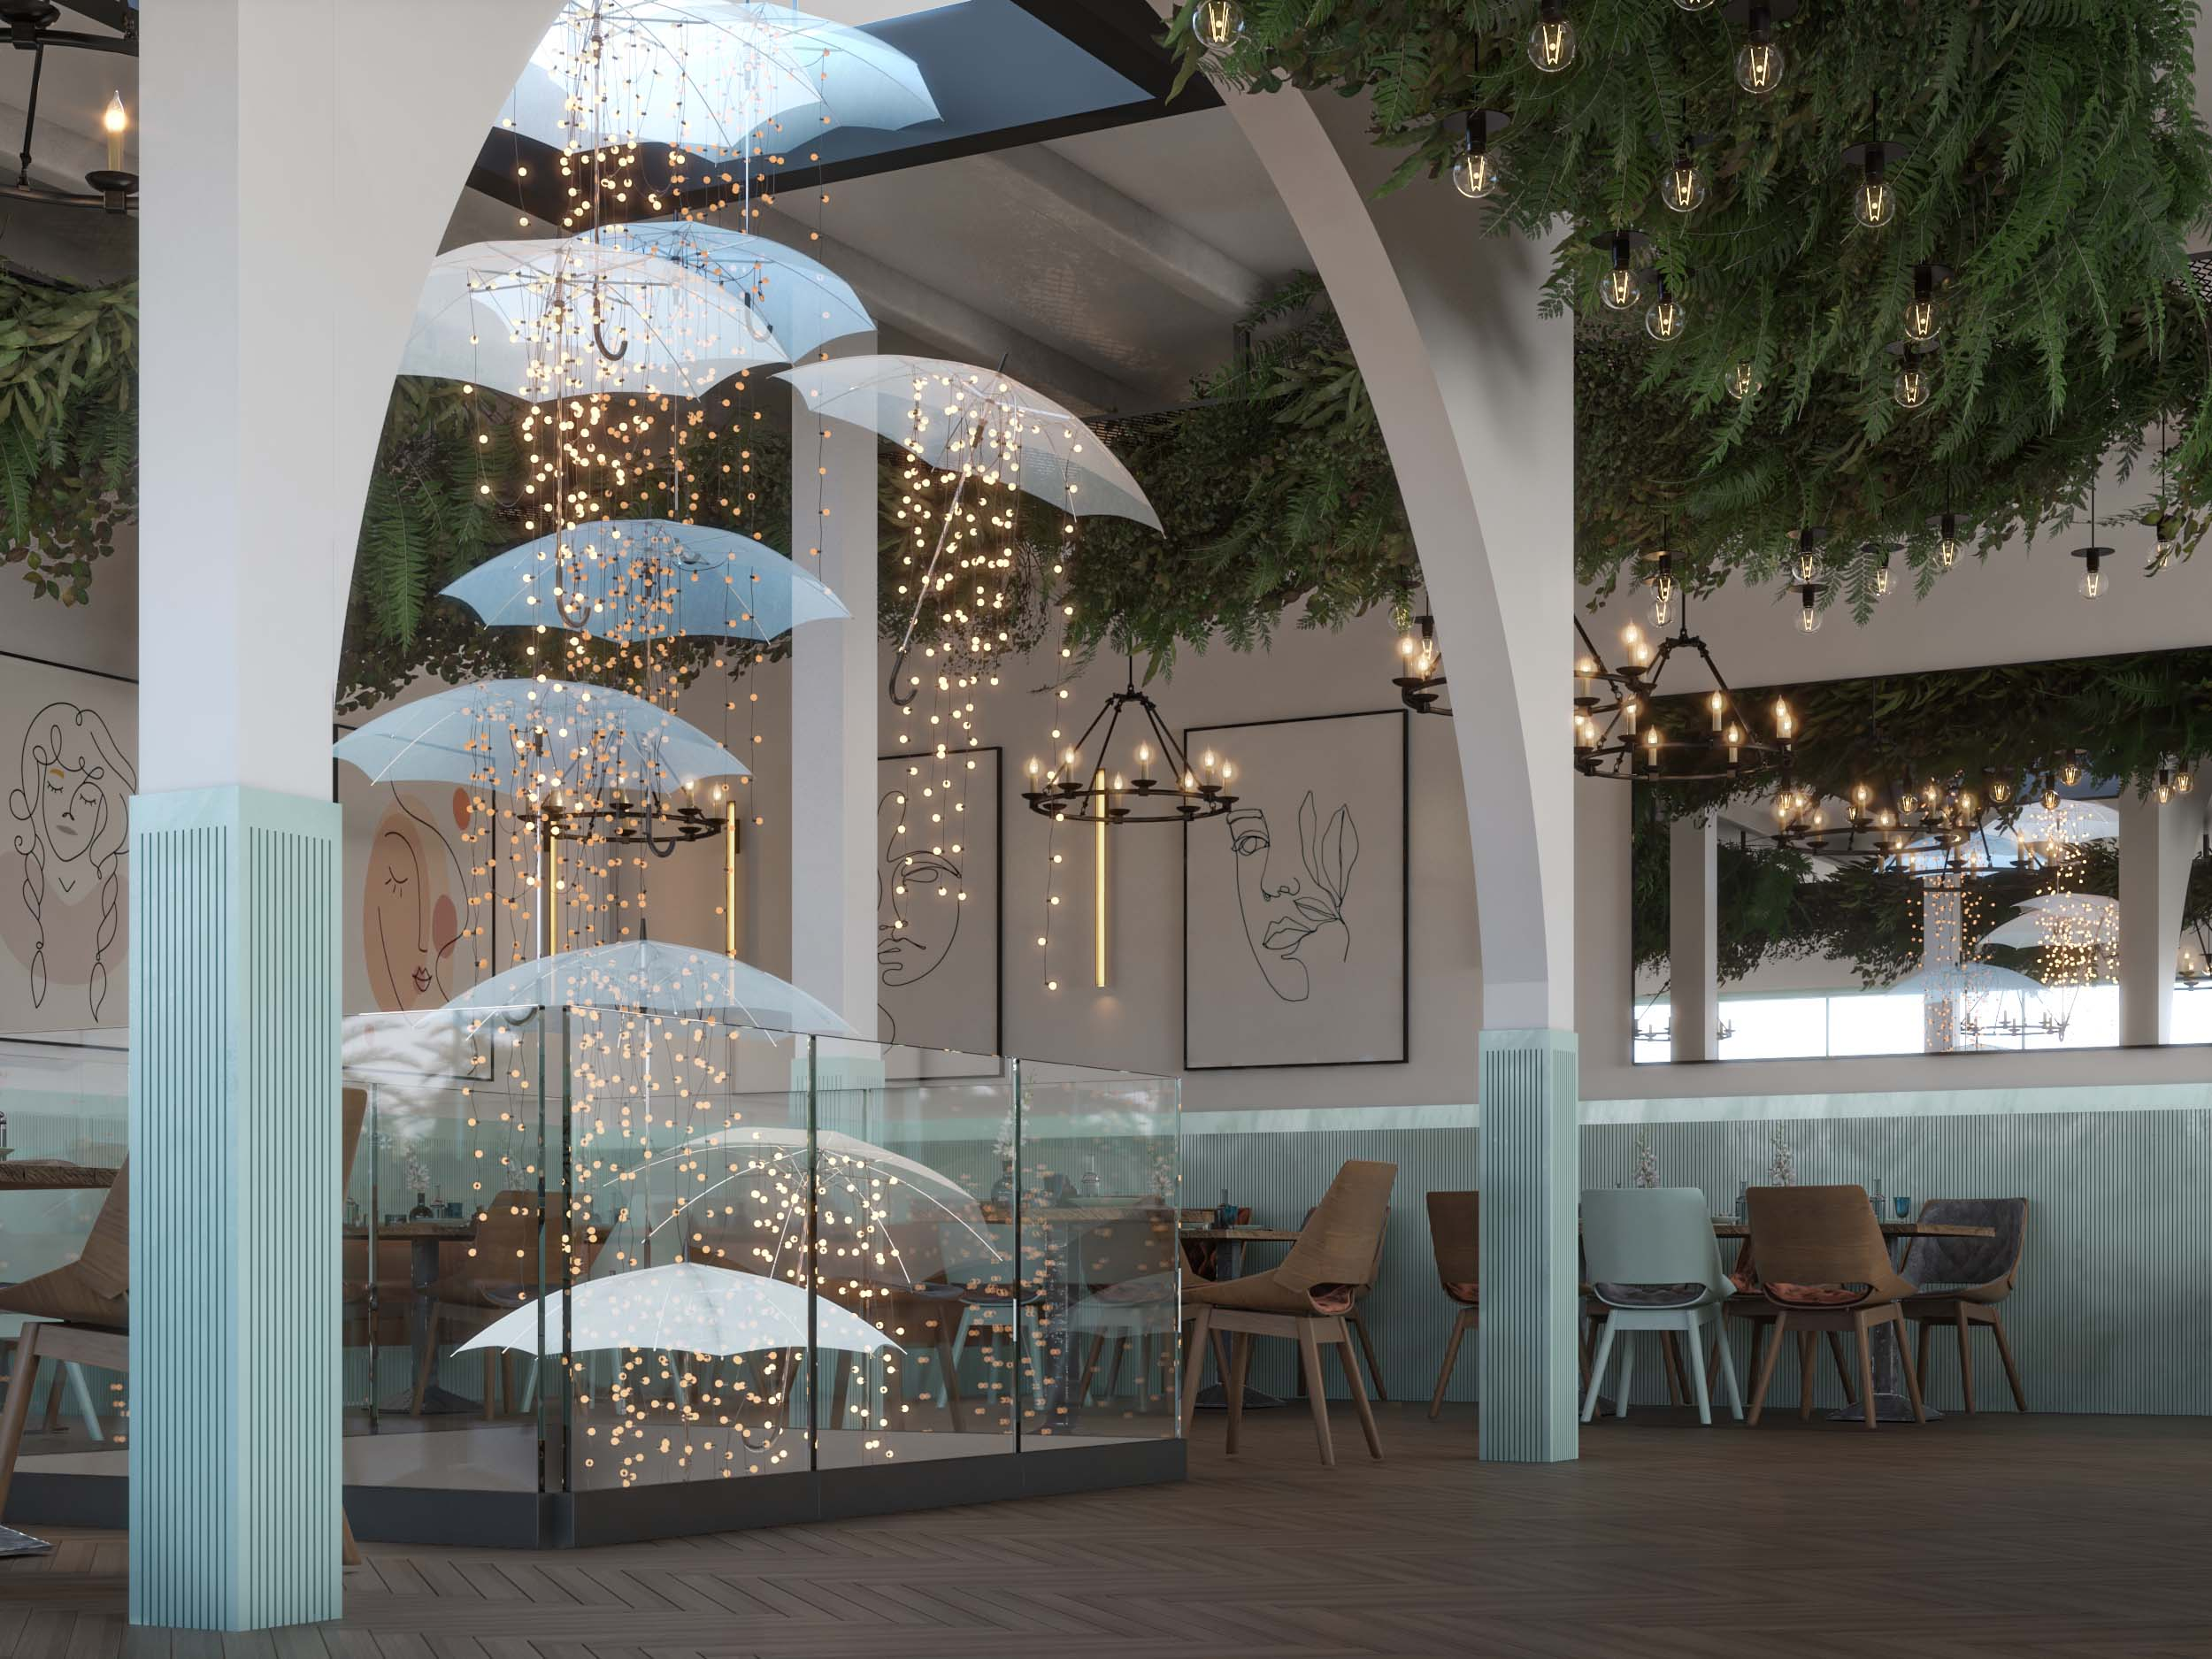 AMERICAN CAFE DESIGN -UMBRELLAS DESIGN - LIGHT WORK